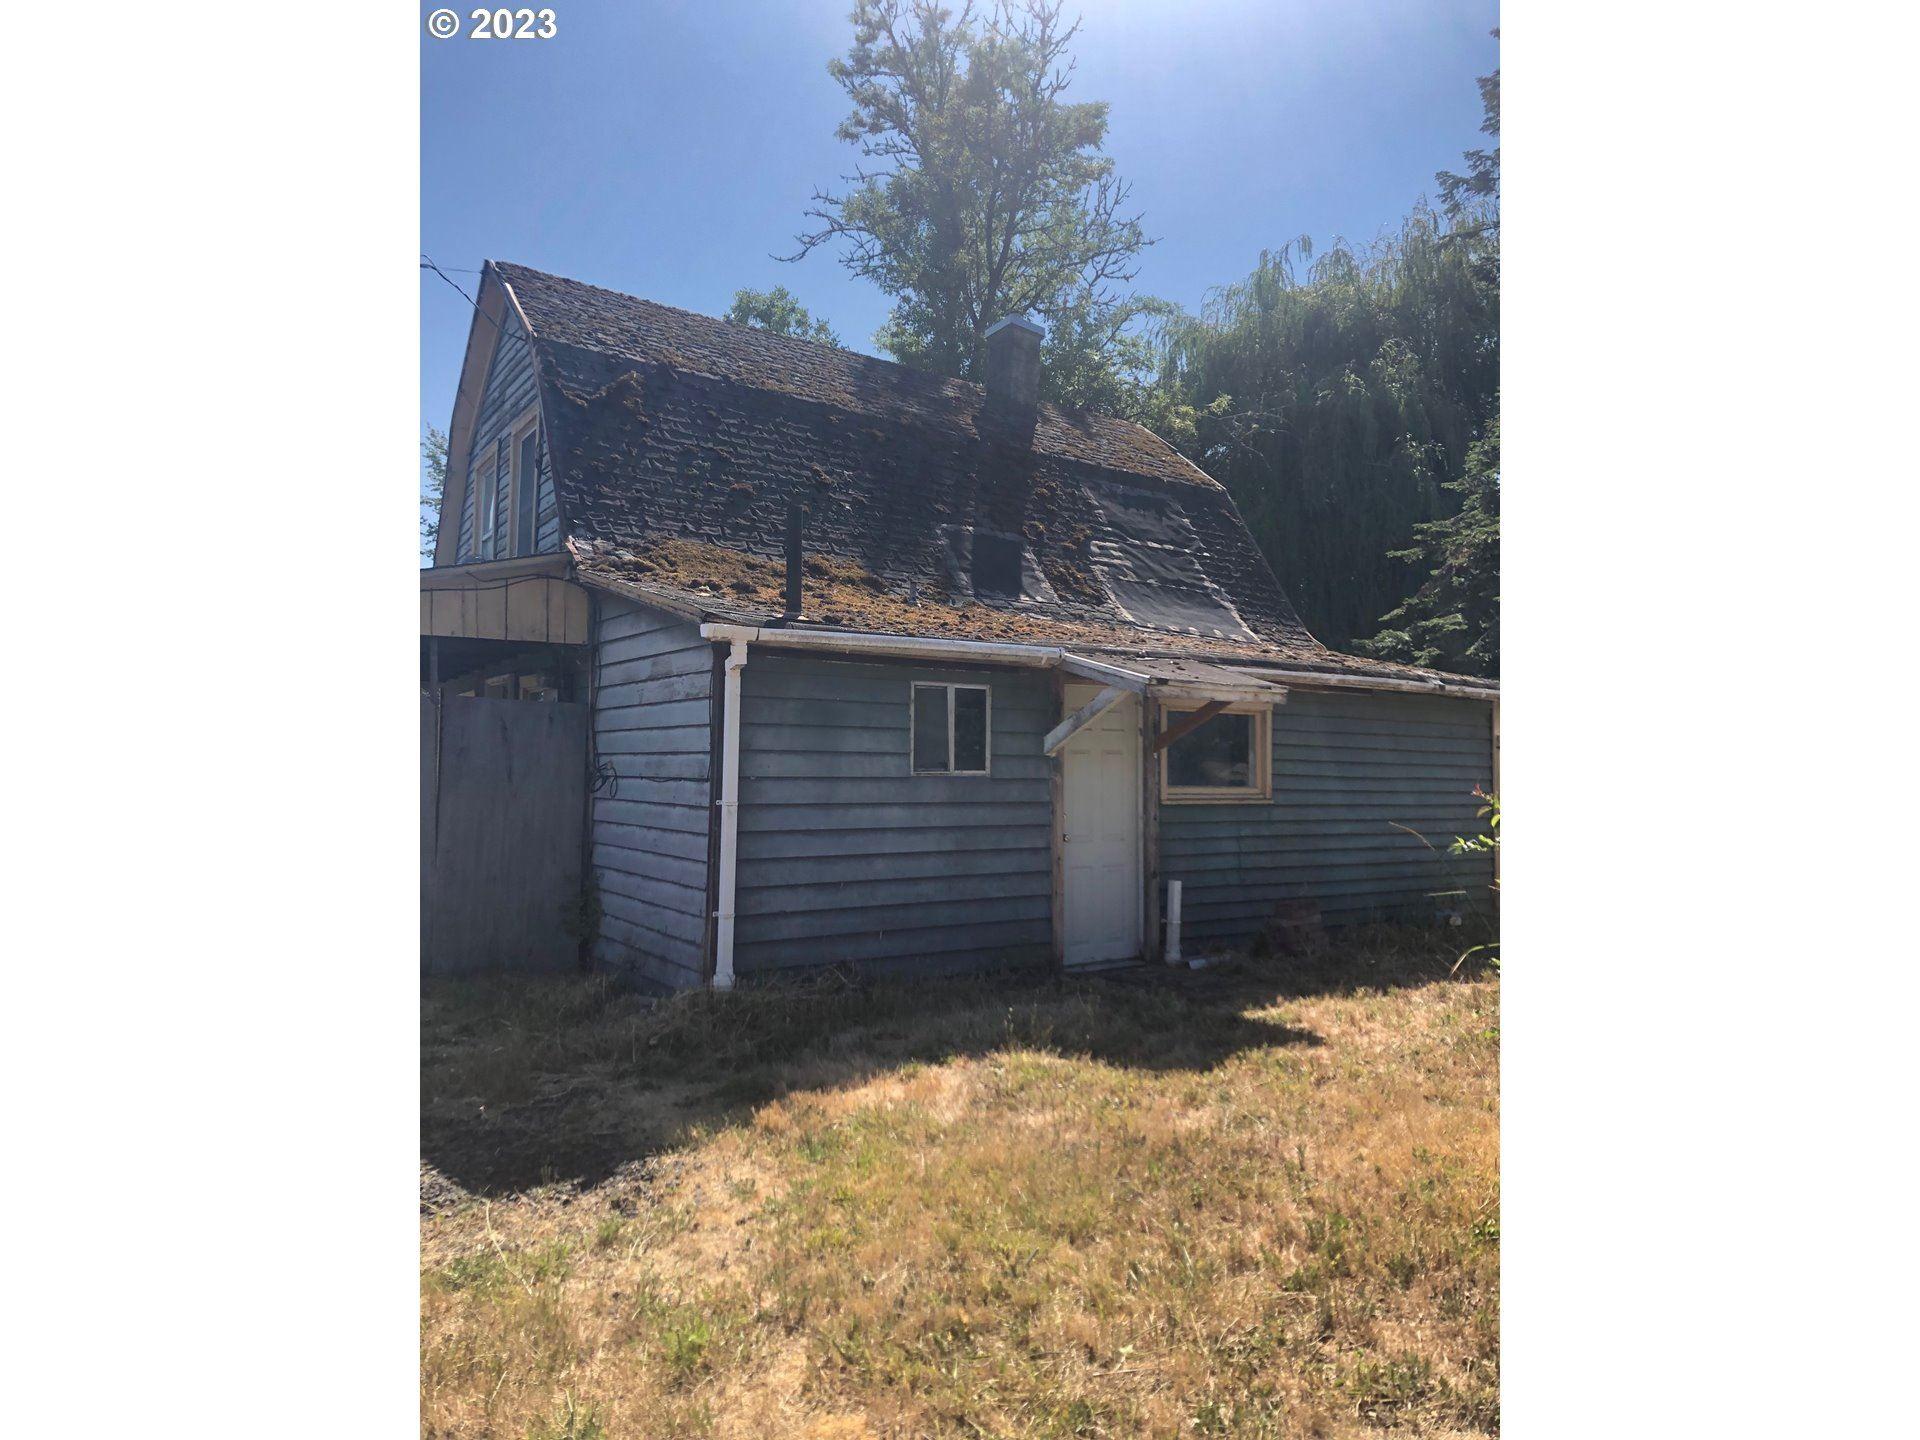 Photo of 510 NE HILL ST, Sheridan, OR 97378 (MLS # 20653057)